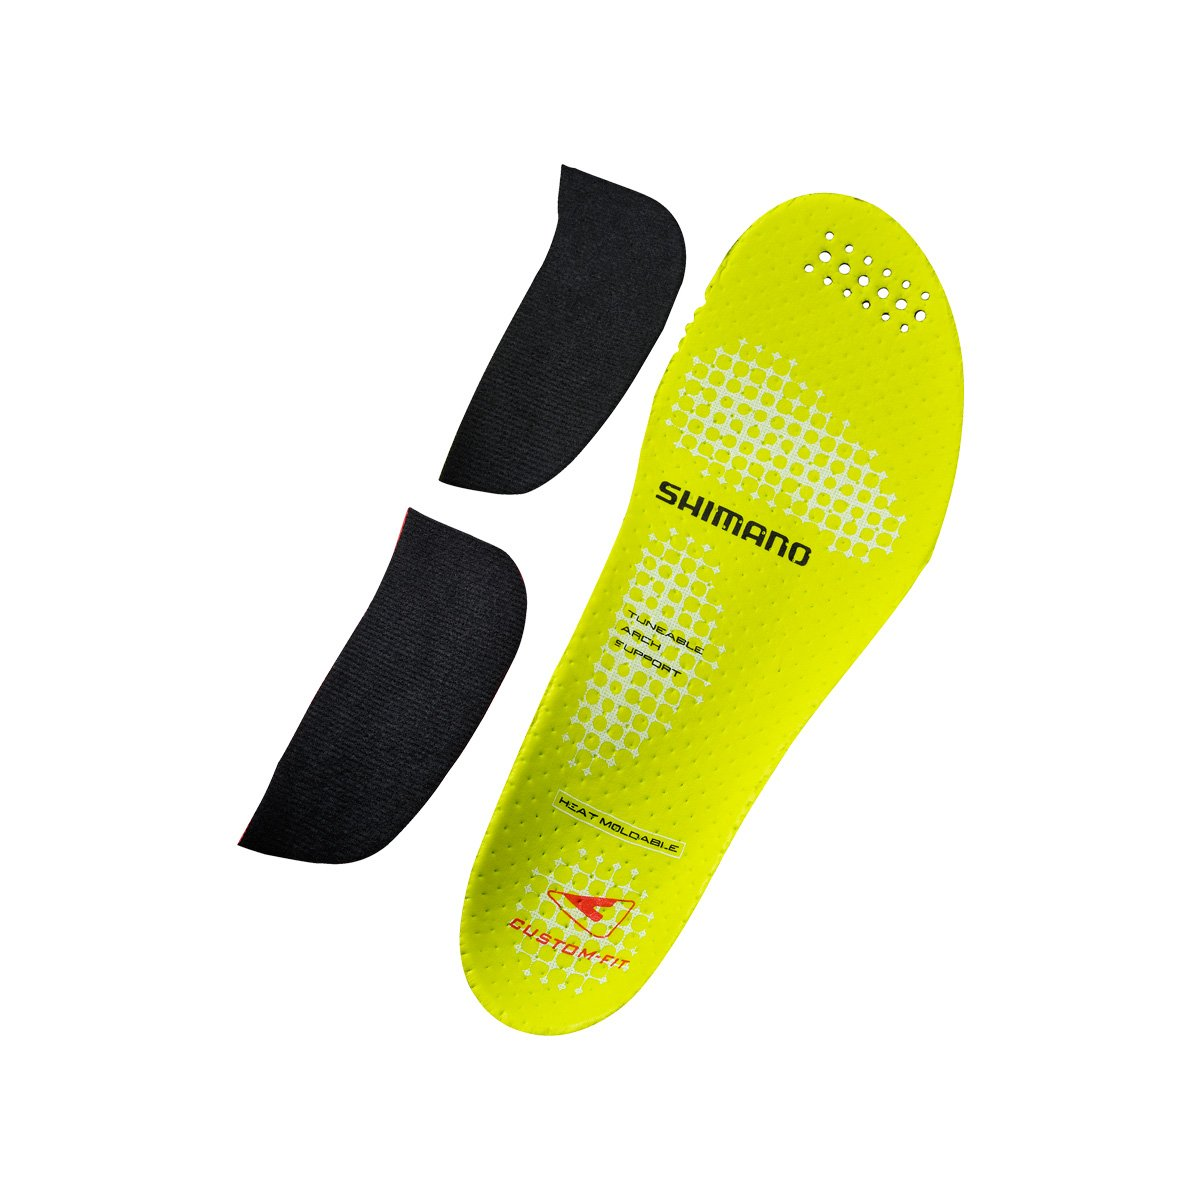 Shimano ESMSHRC9INCF サイクリングシューズ用インソール カスタムフィット B06XJSDP4S 42-43.5|イエロー イエロー 42-43.5